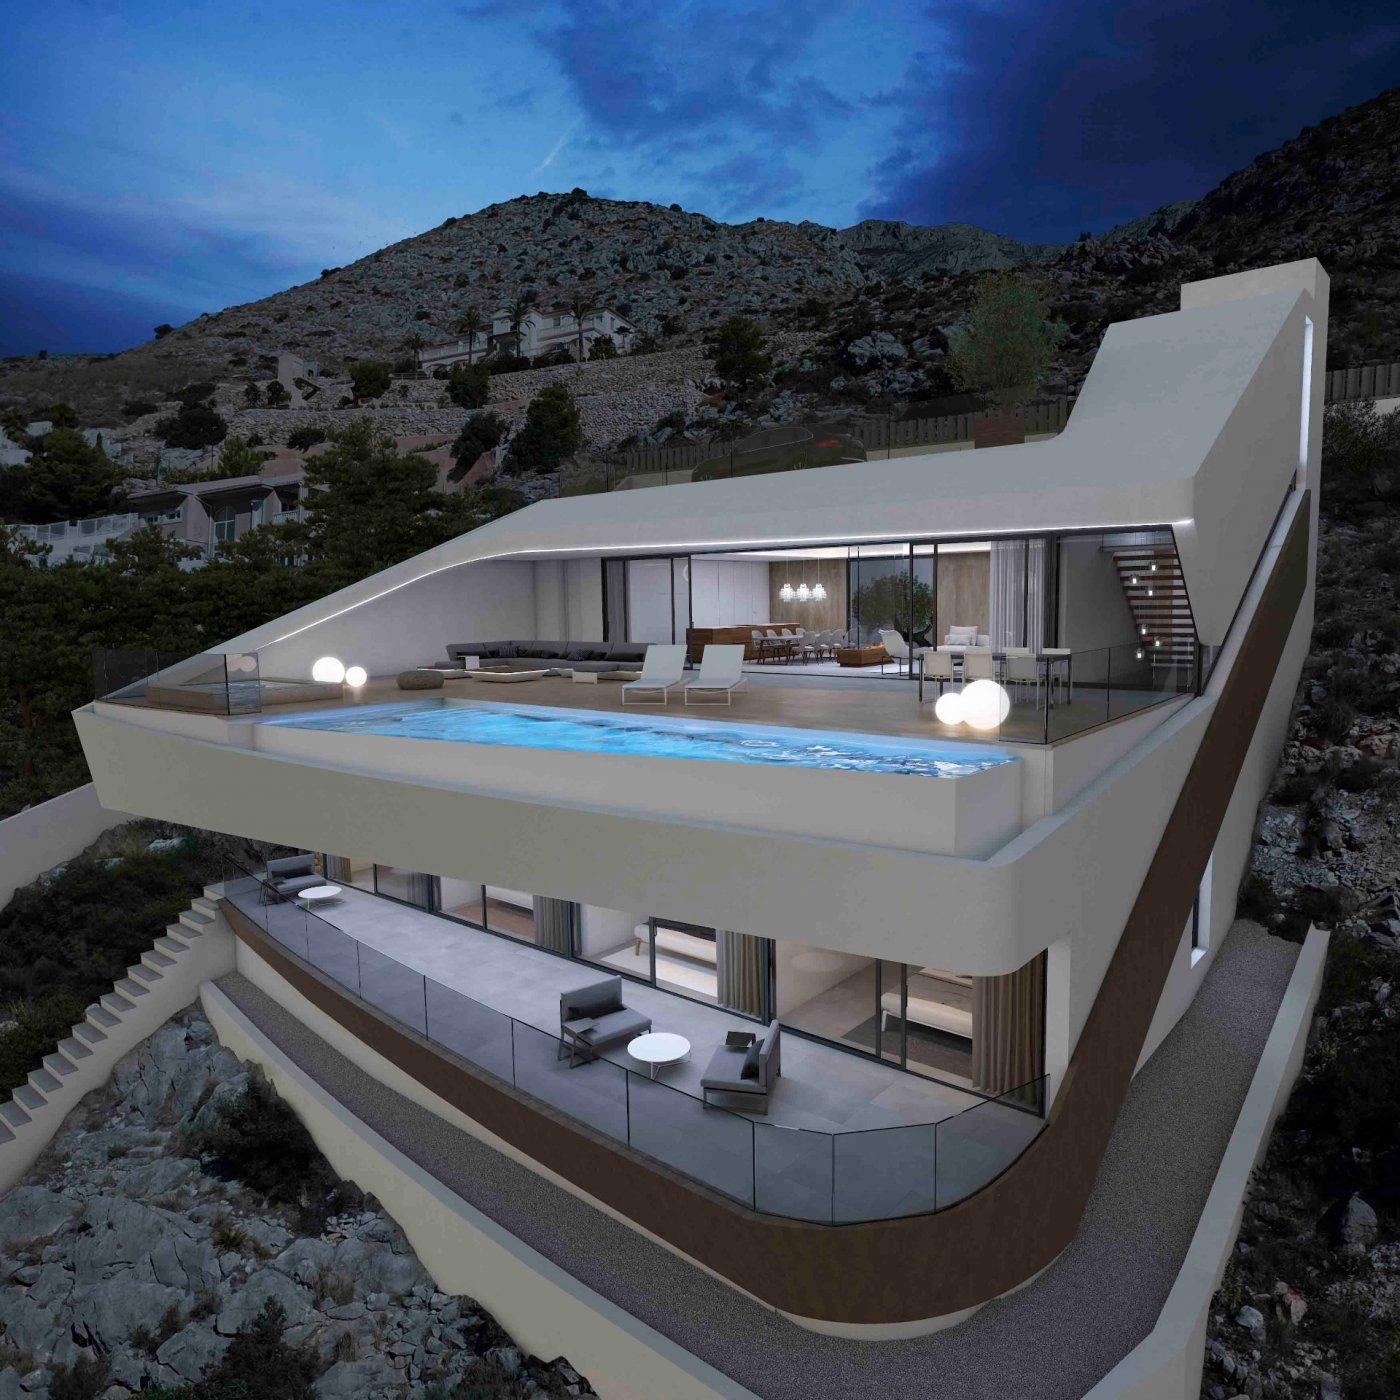 Property for sale - Villa · Altea - Estate Agents Altea